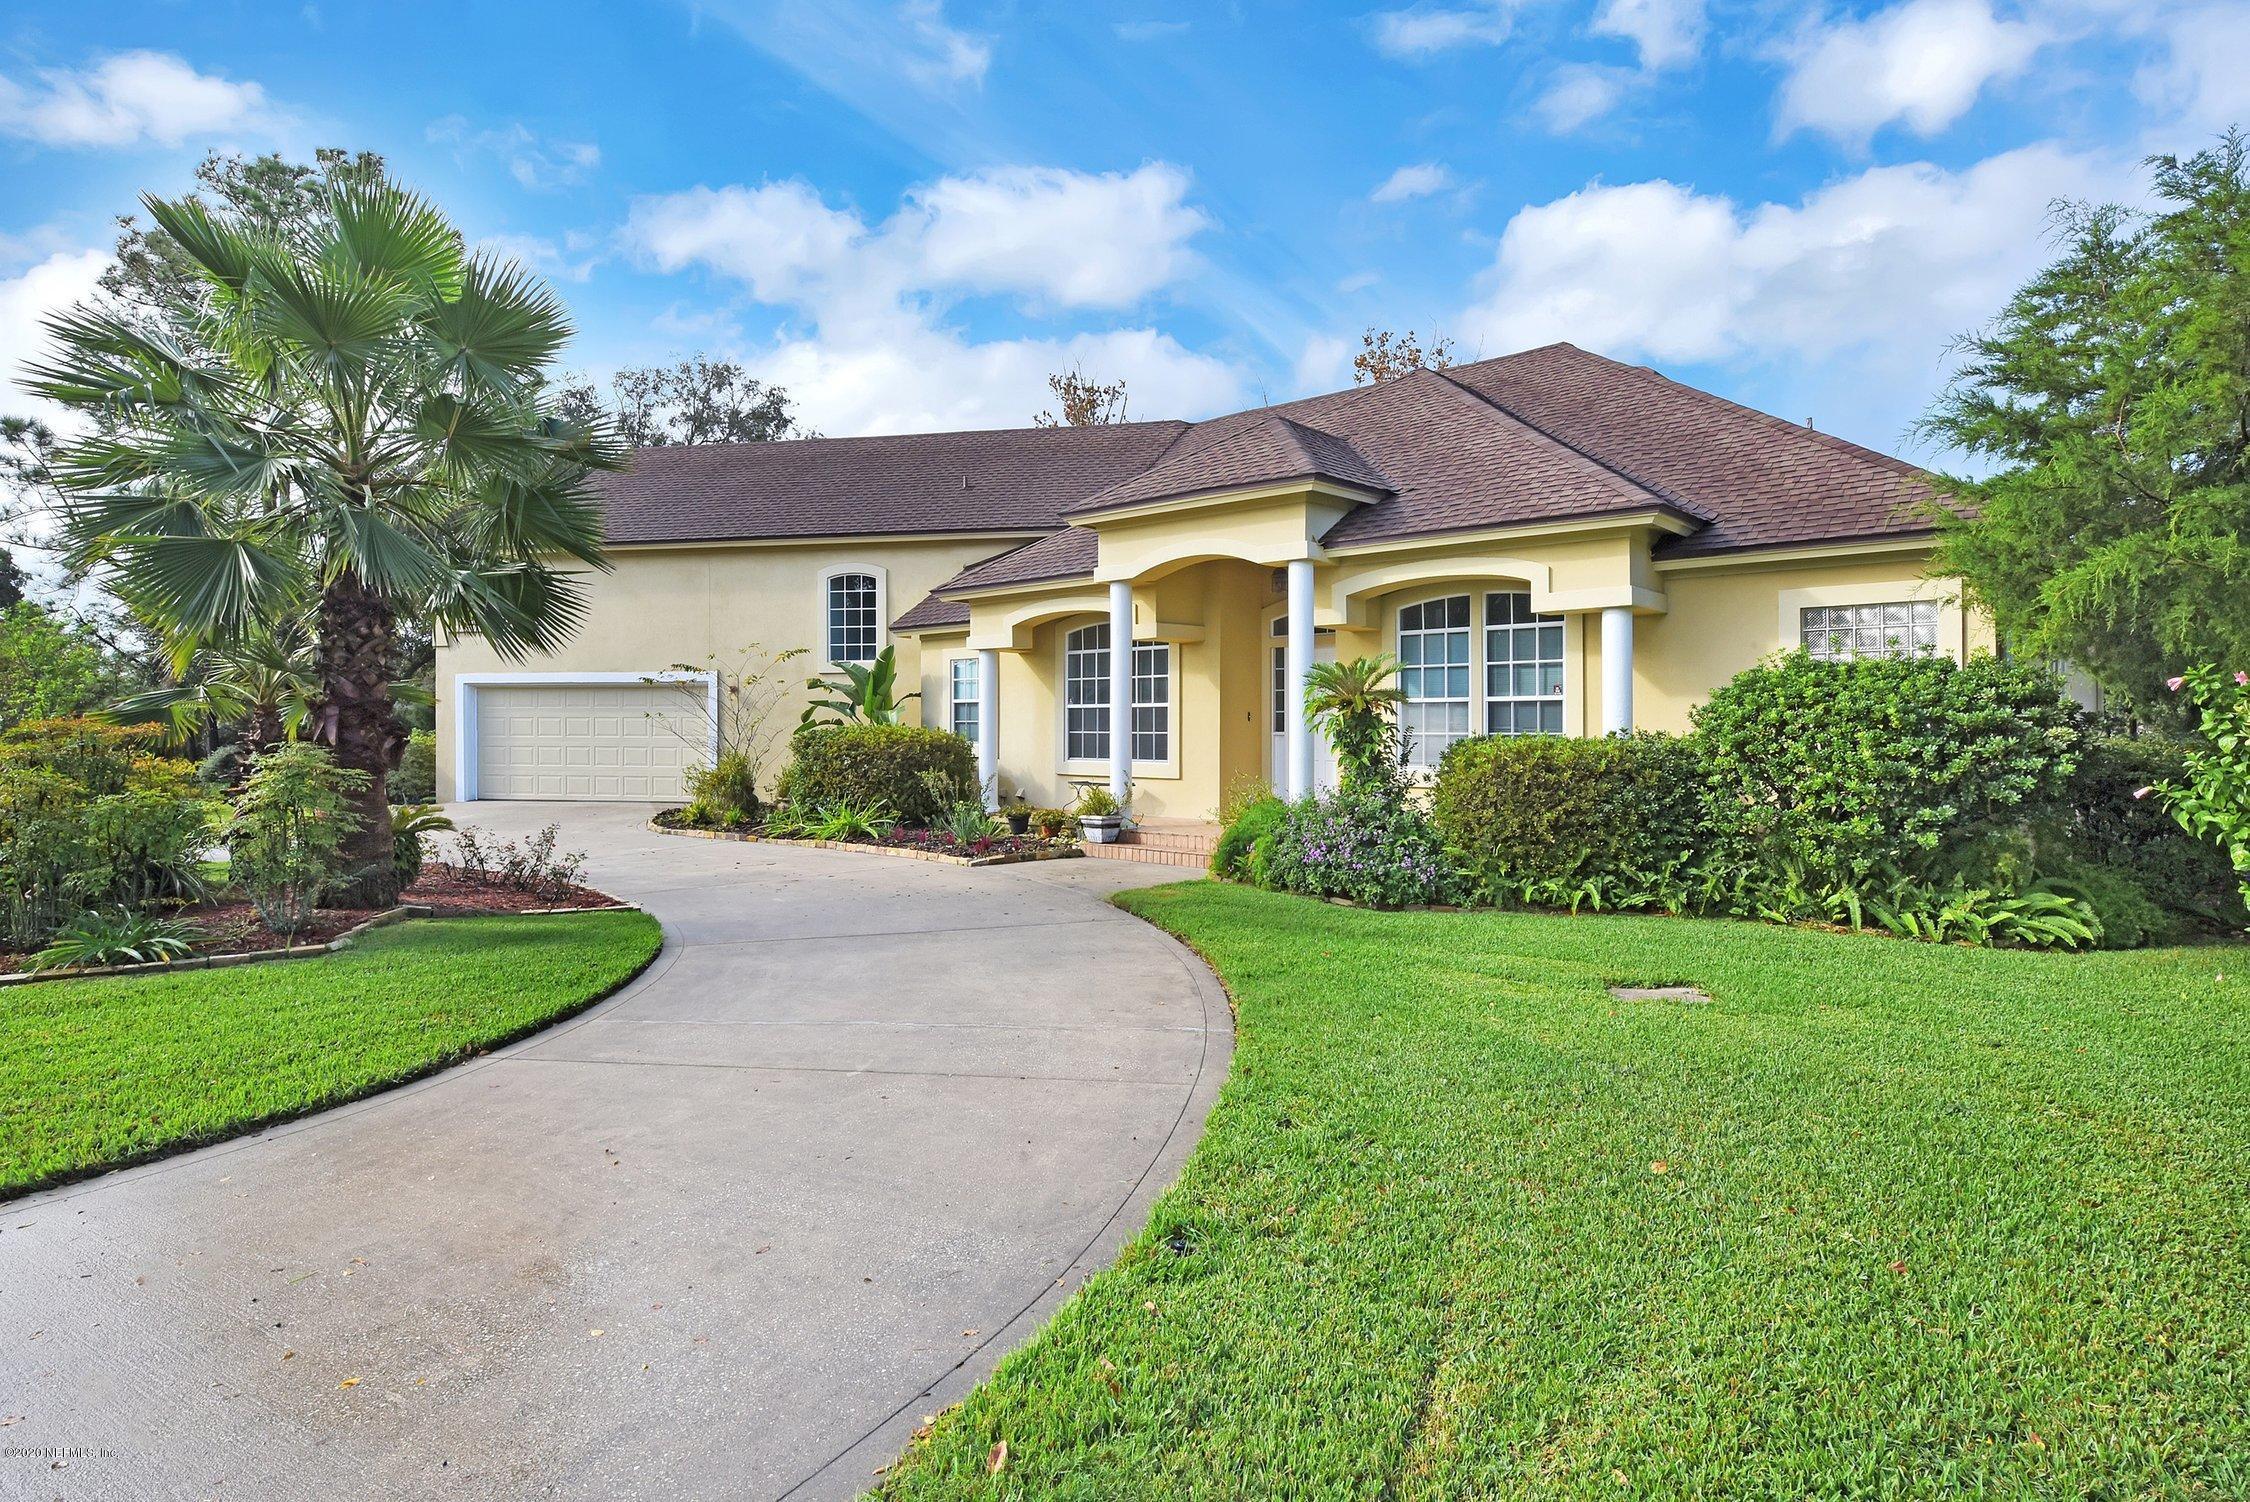 Details for 2385 Pine Island Ct, JACKSONVILLE, FL 32224